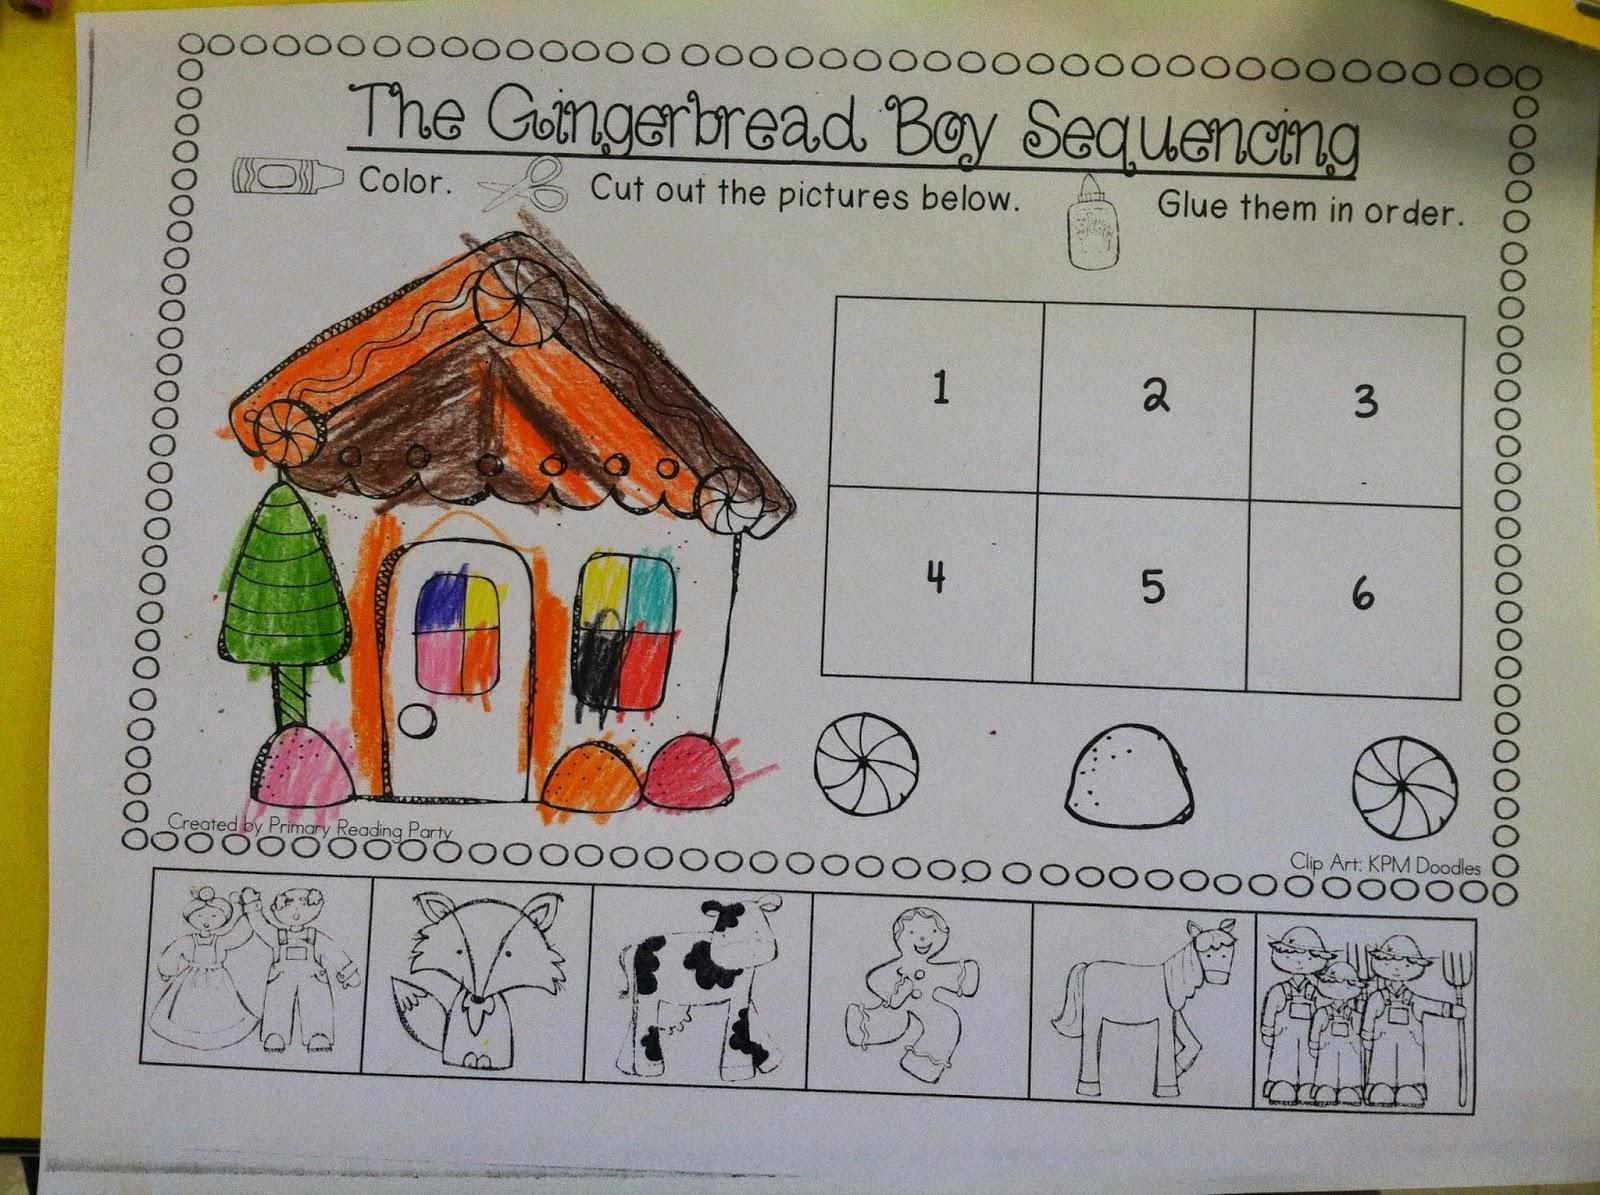 Gingerbread Boy Sequencing